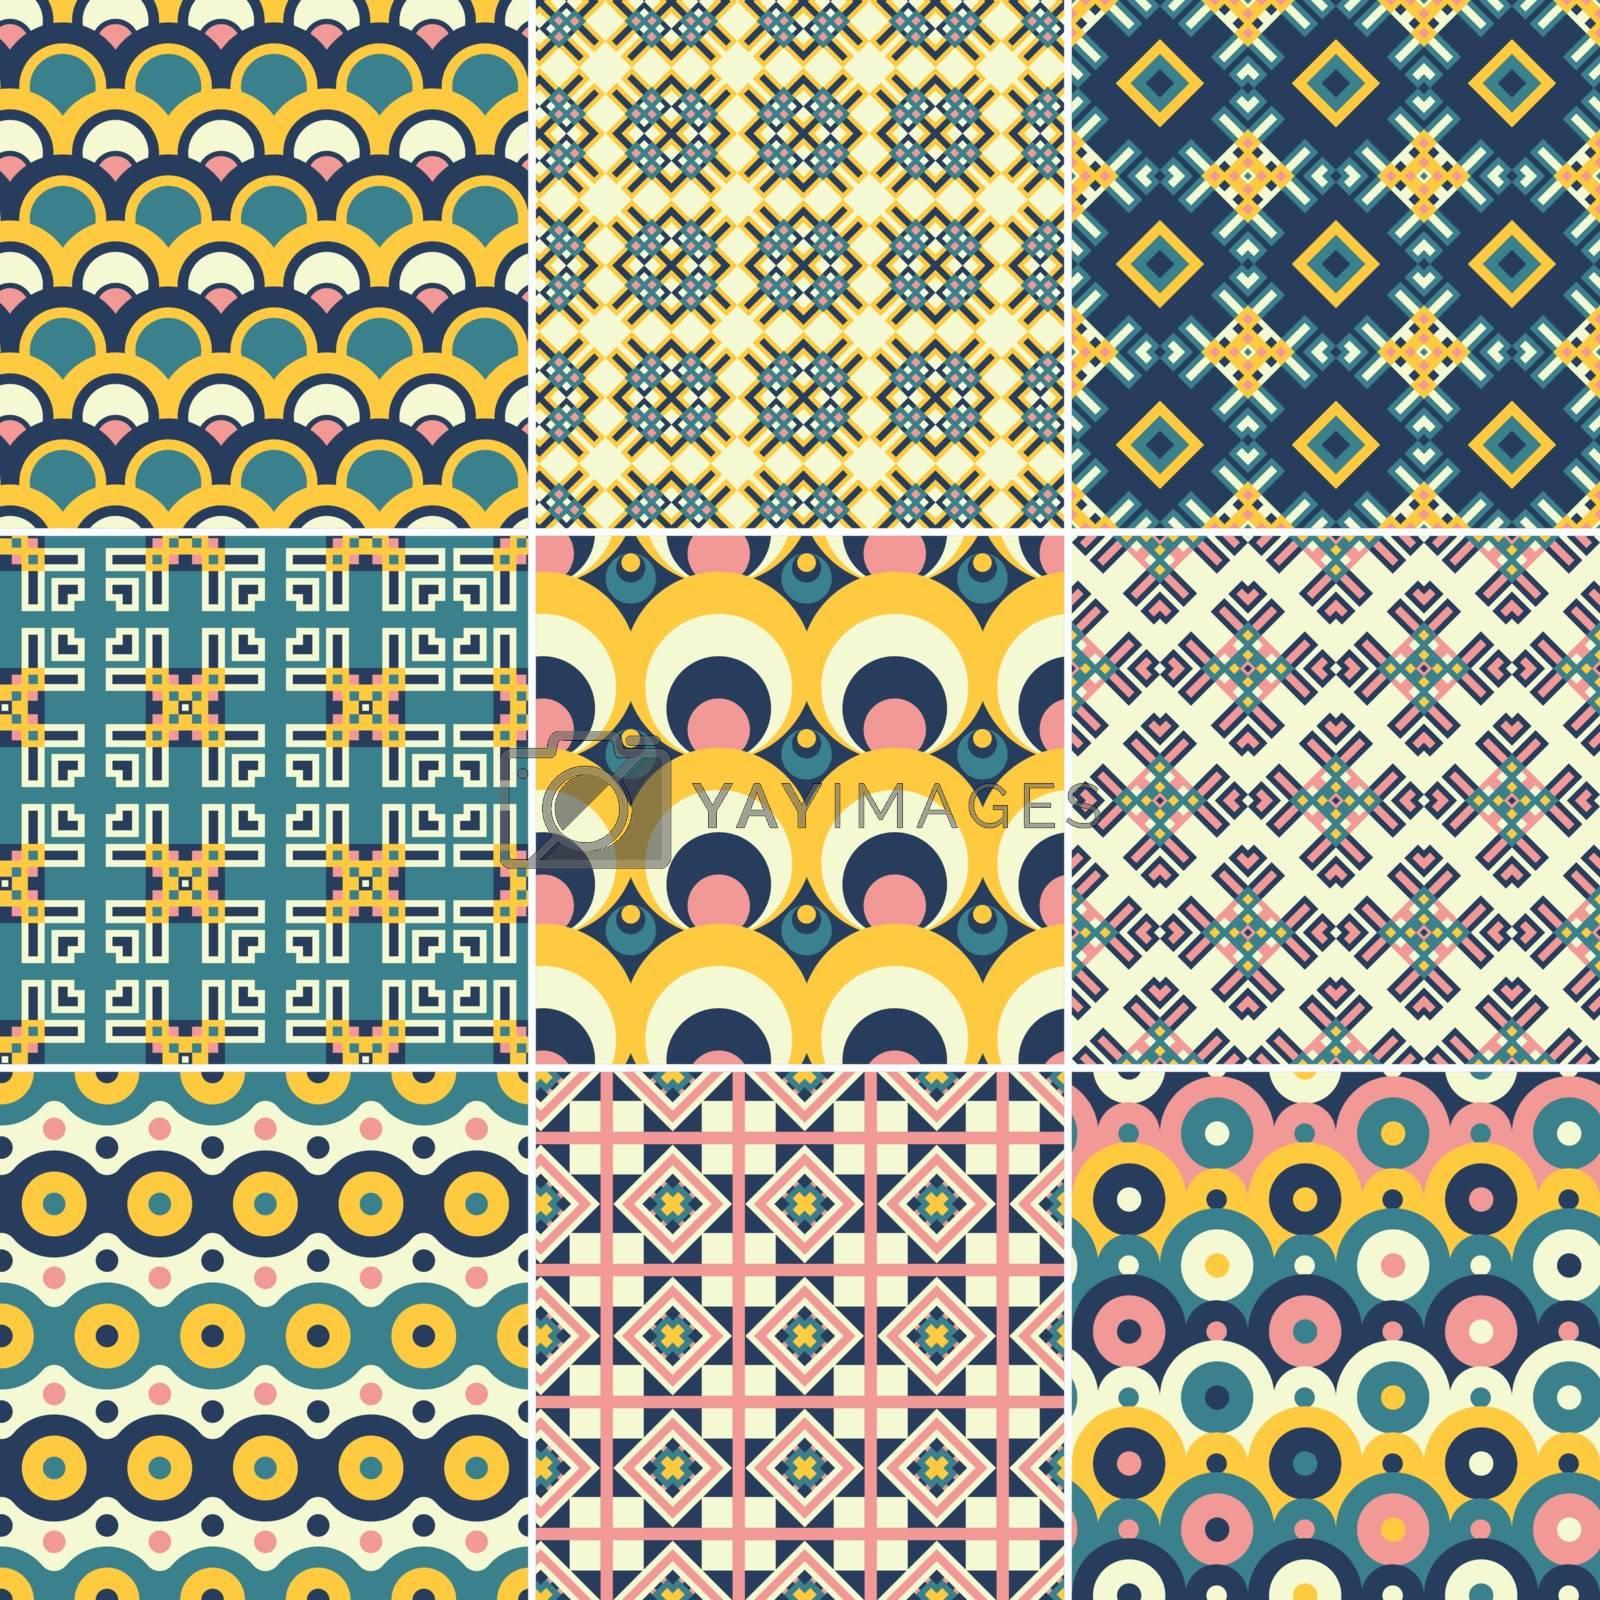 Set of nine vector seamless geometrical patterns. Vintage textures. Decorative background for cards, invitations, web design. Retro digital paper.